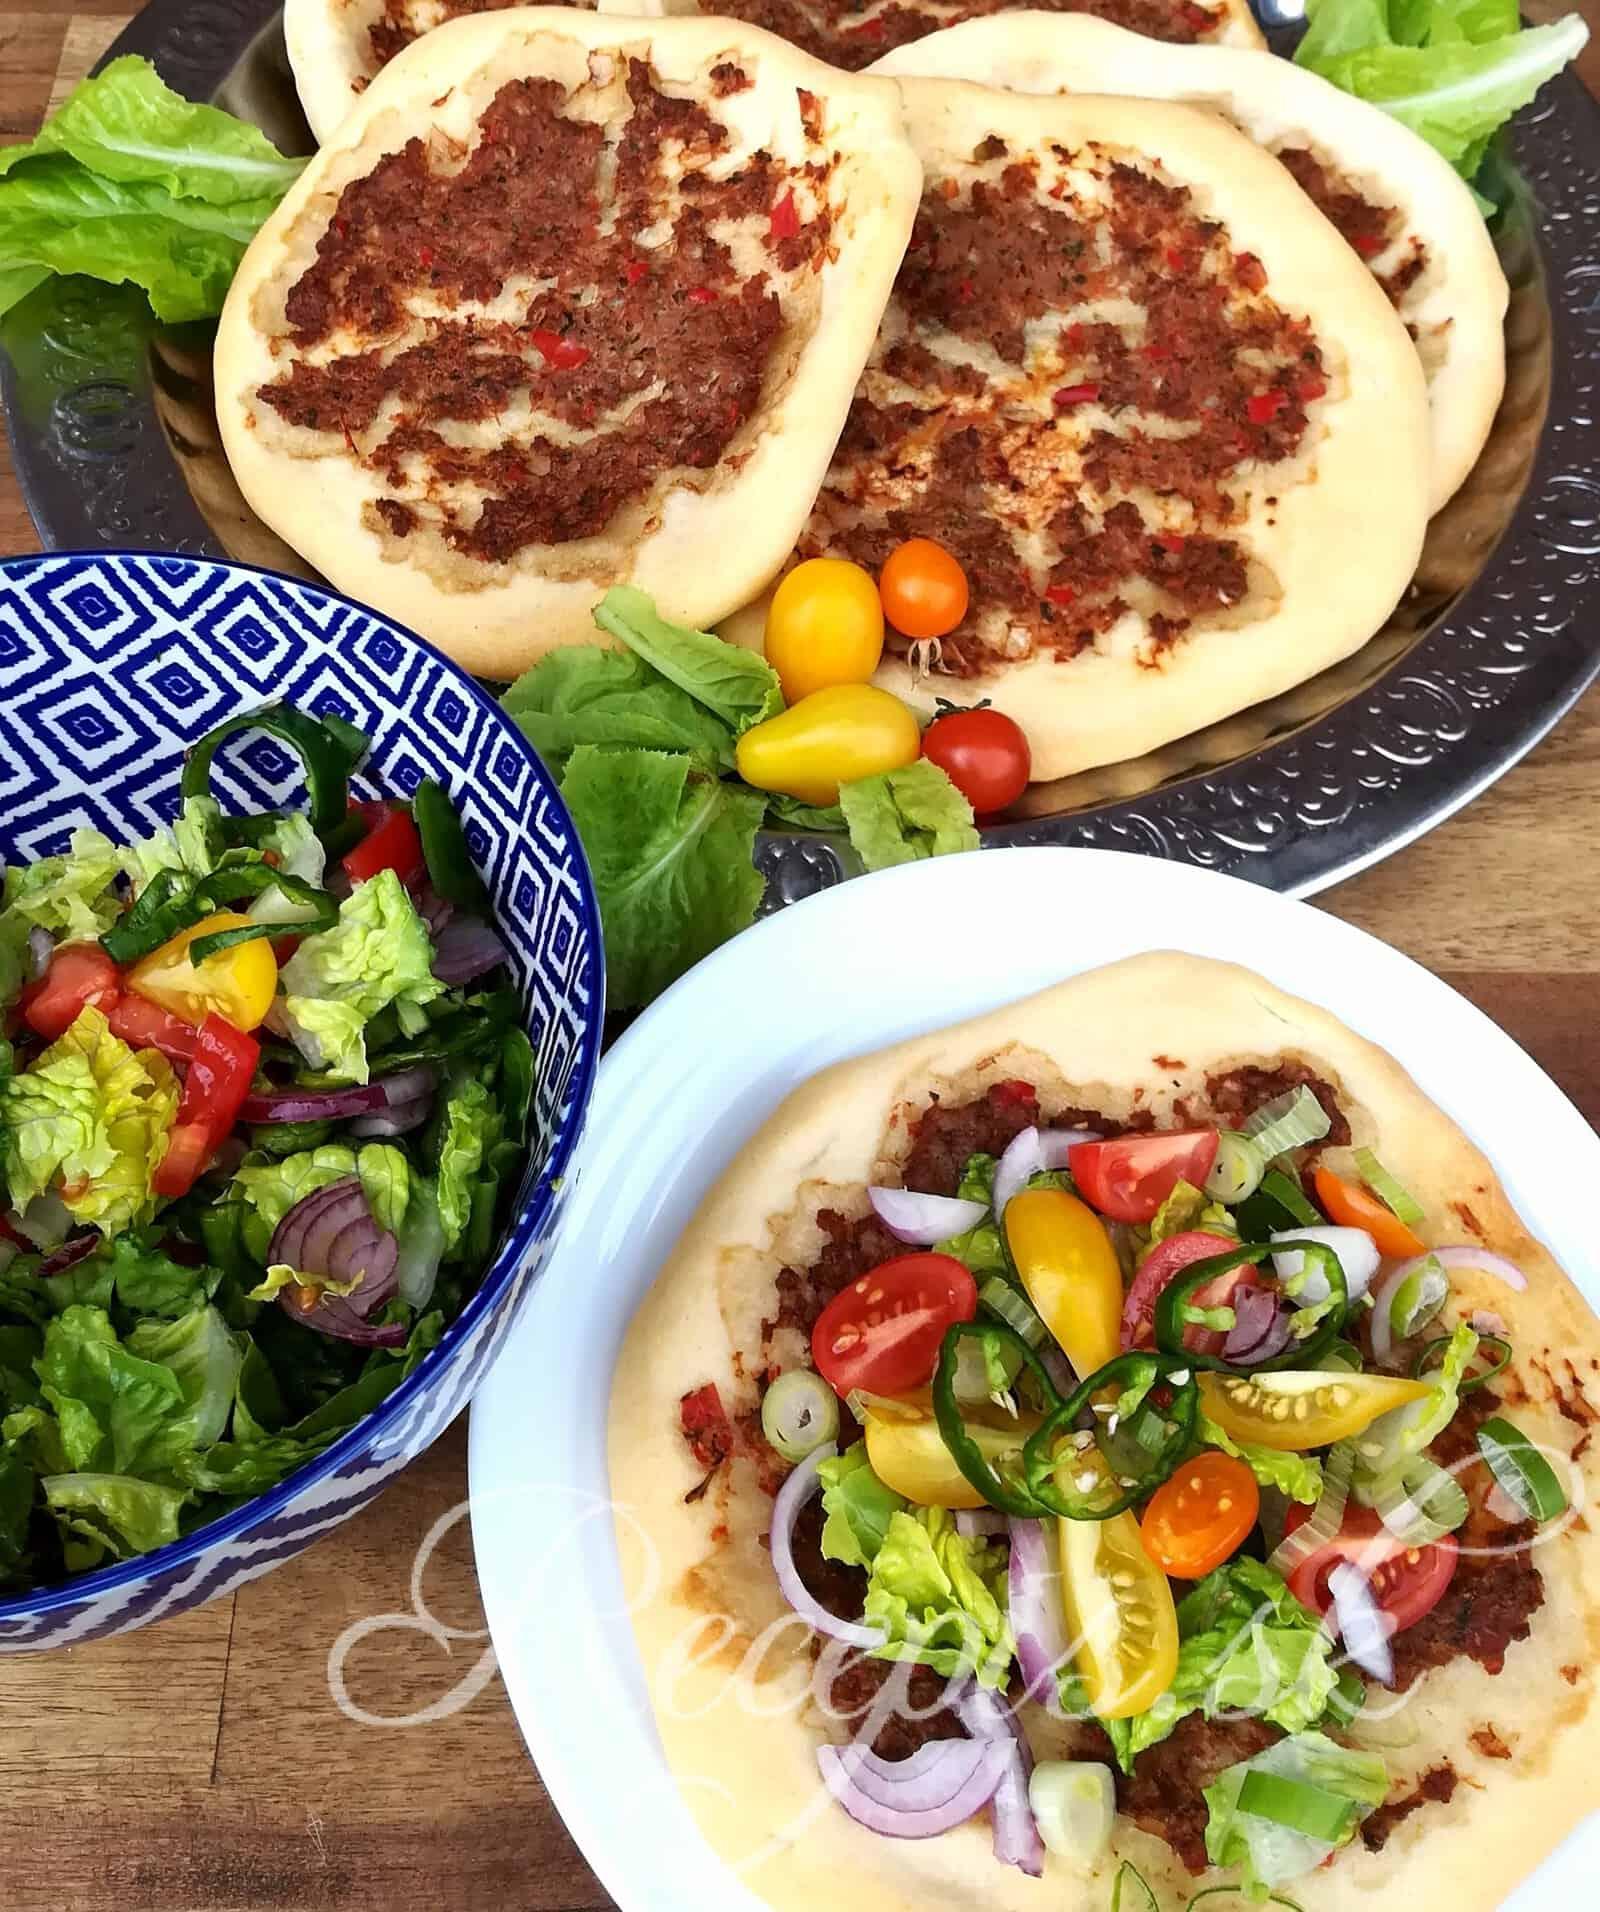 Turecká pizza Lahmacun